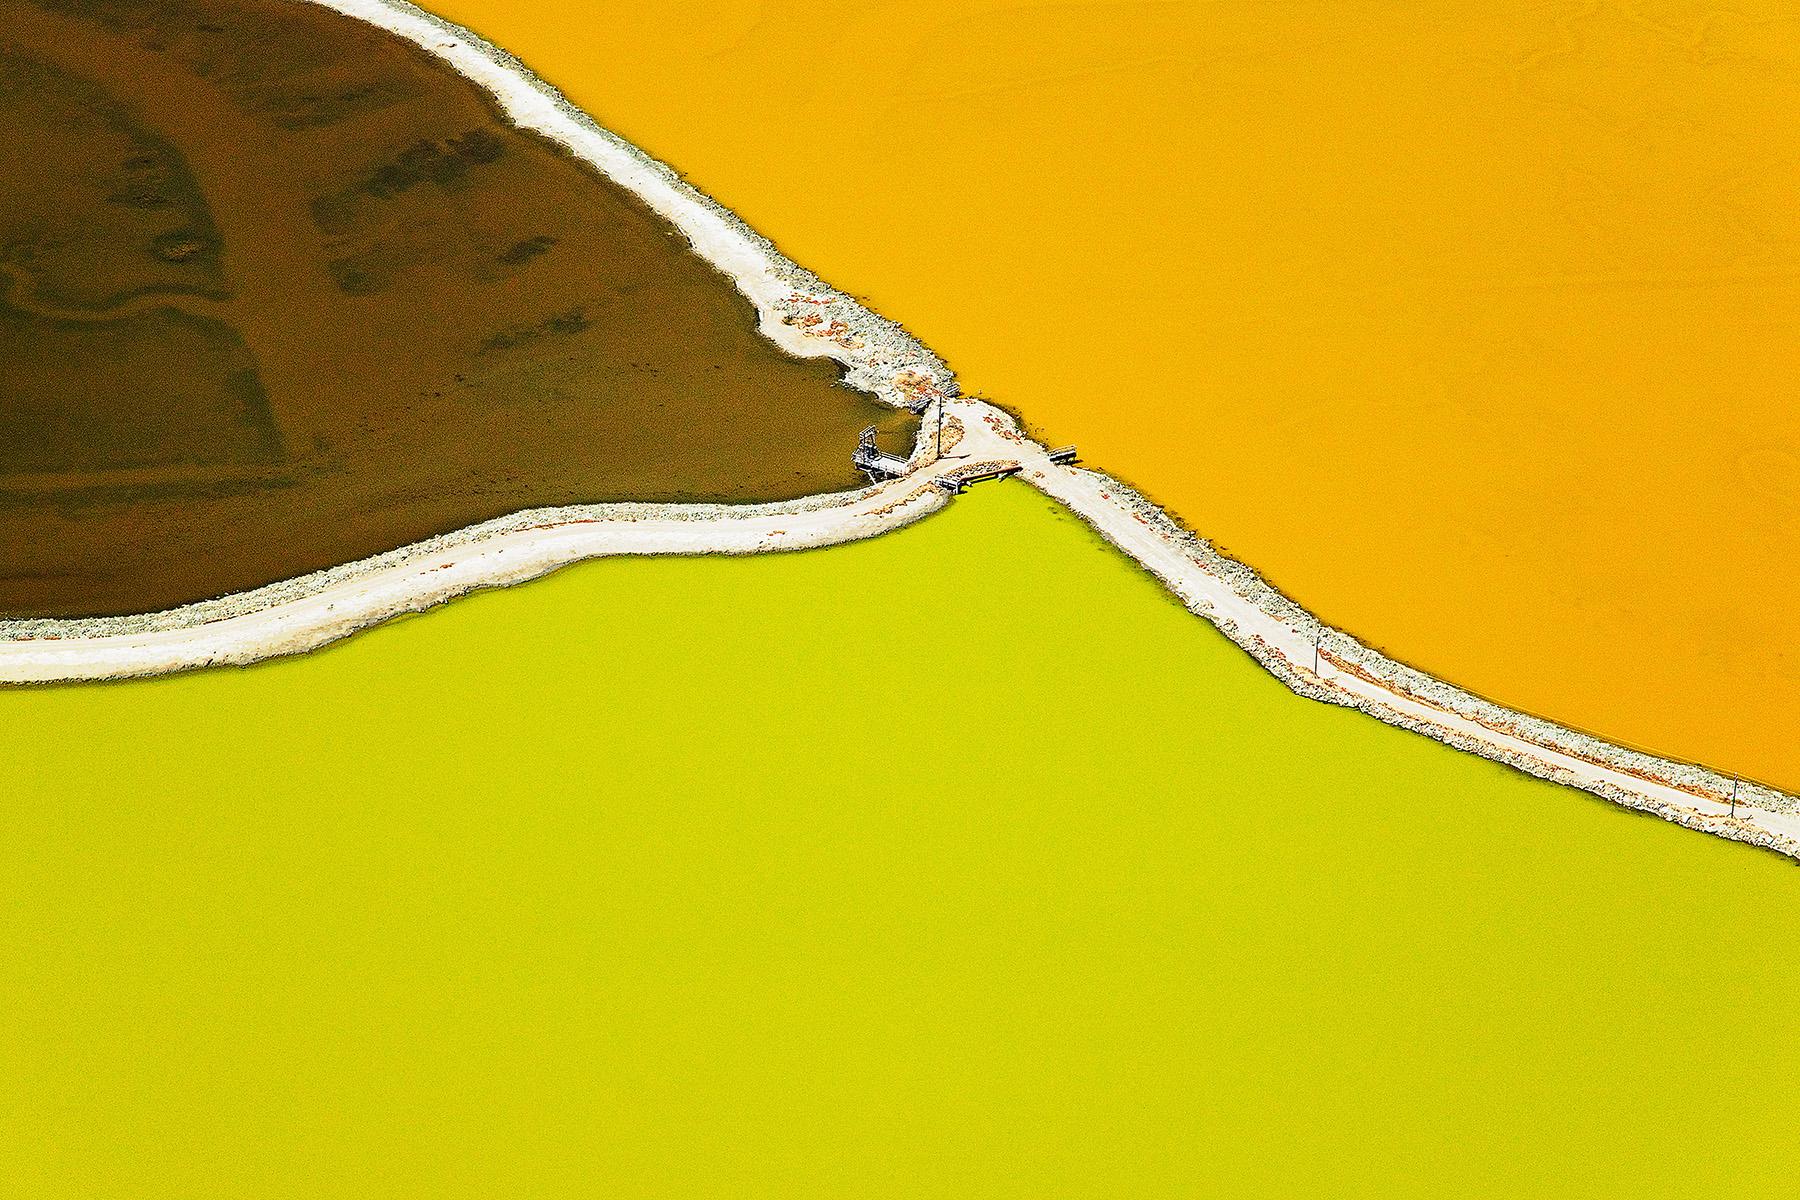 Colin_McRae_SF Bay Salt Ponds_Orange Lime One_2.jpg